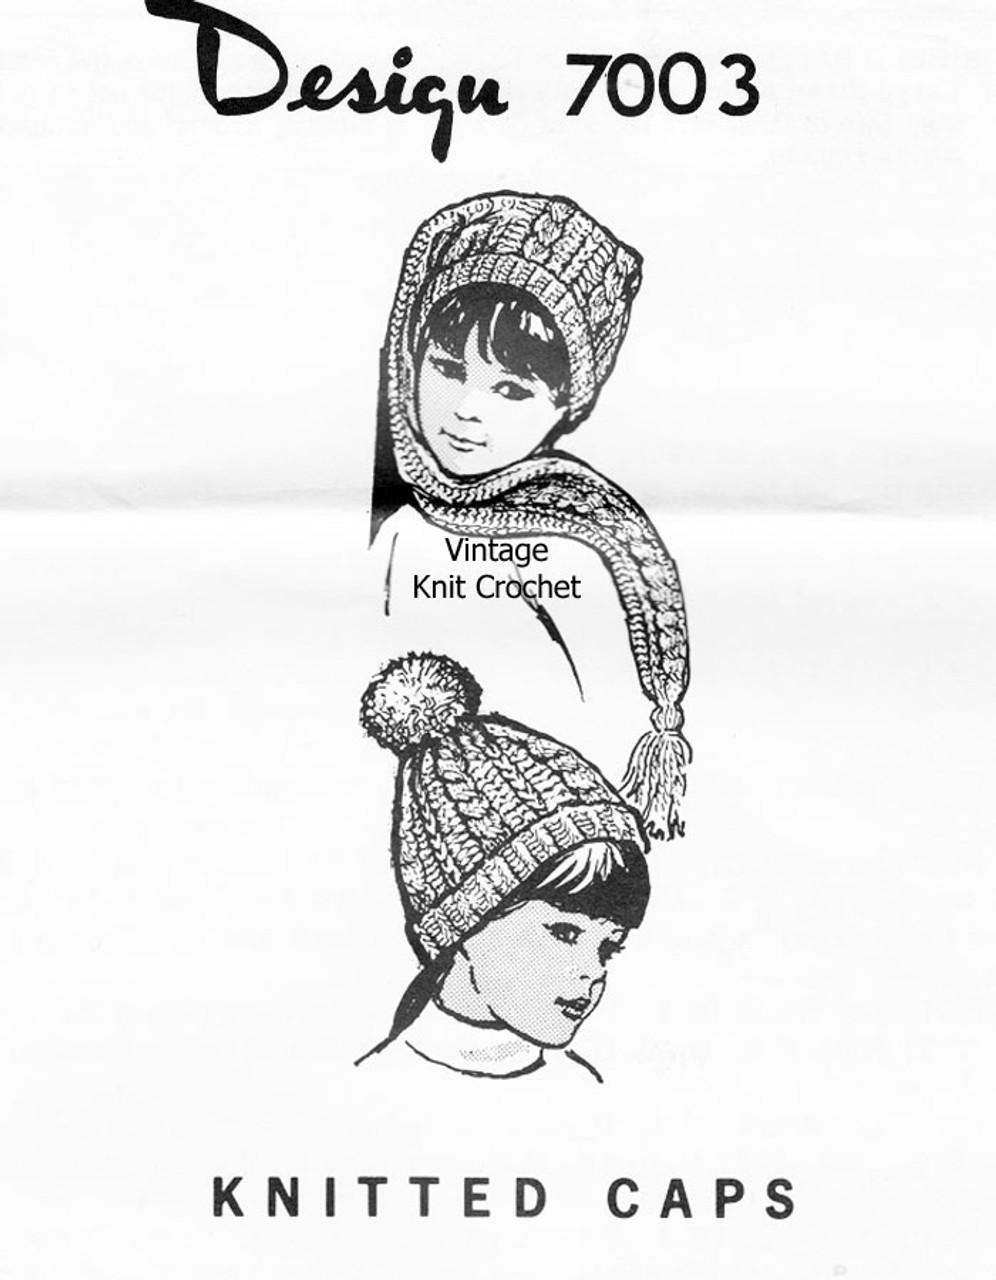 Childs Knitted Beanie Cap Pattern, Design 7003